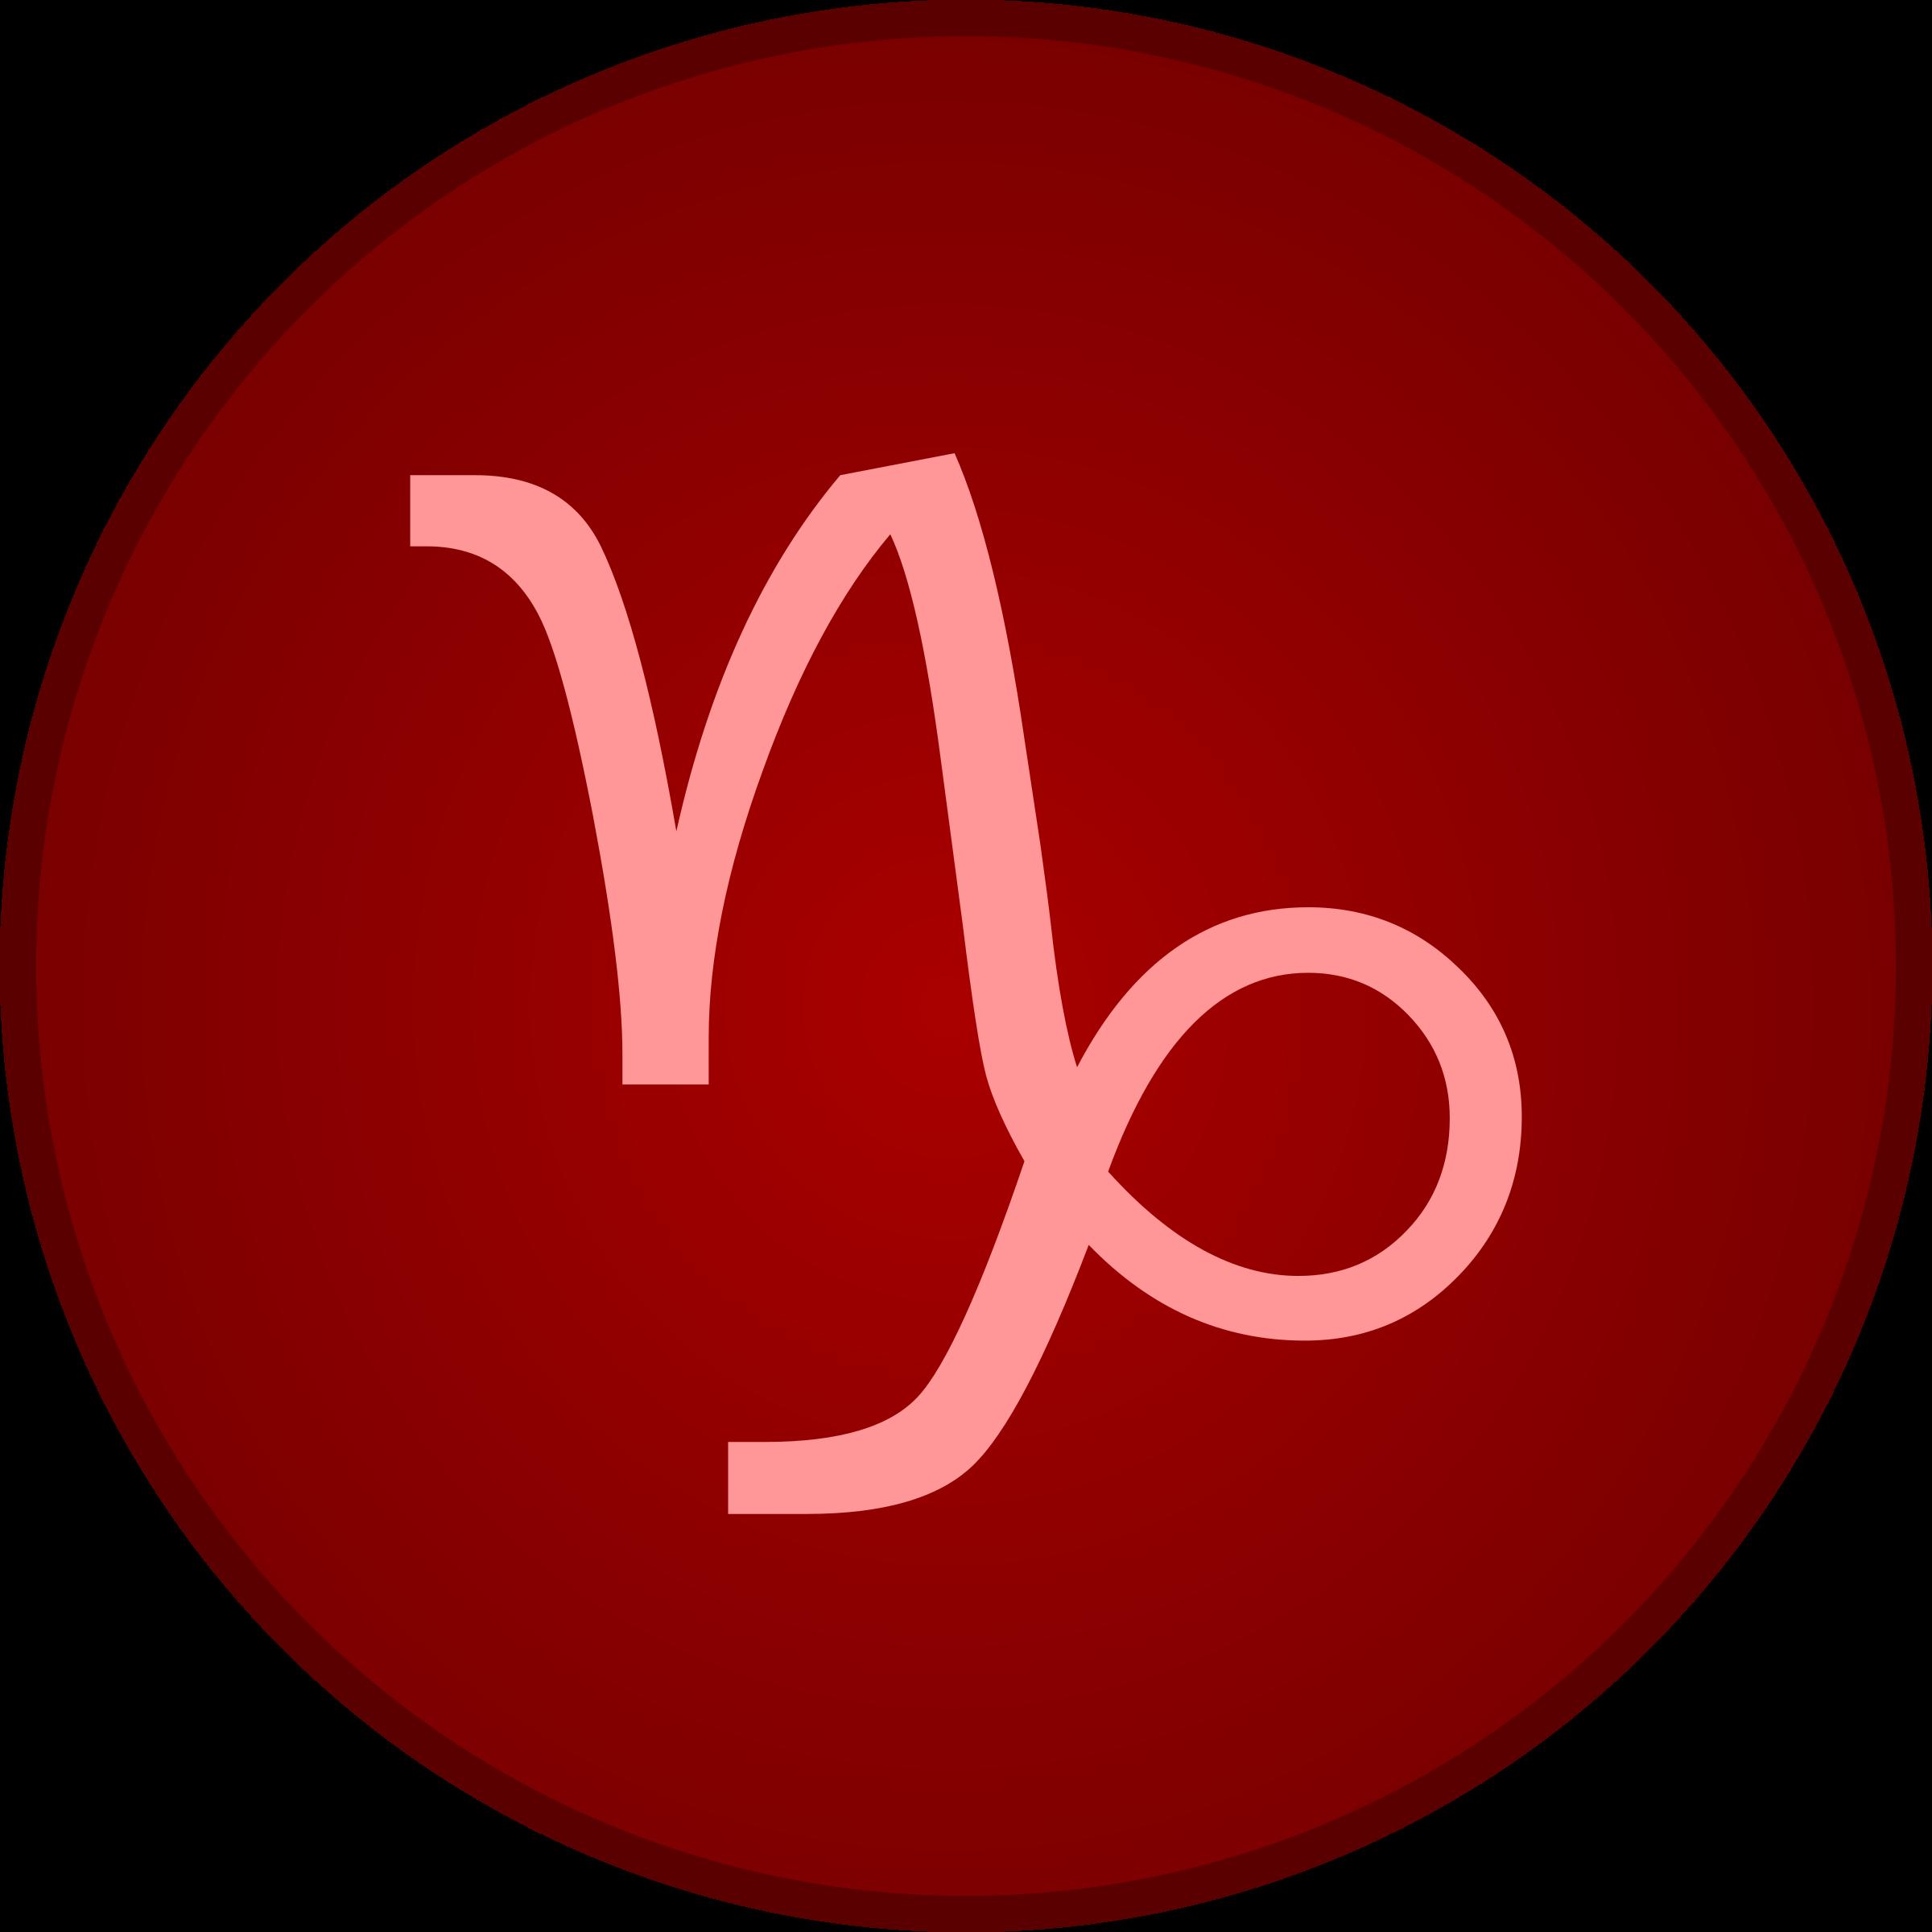 Capricorn symbol by Firkin